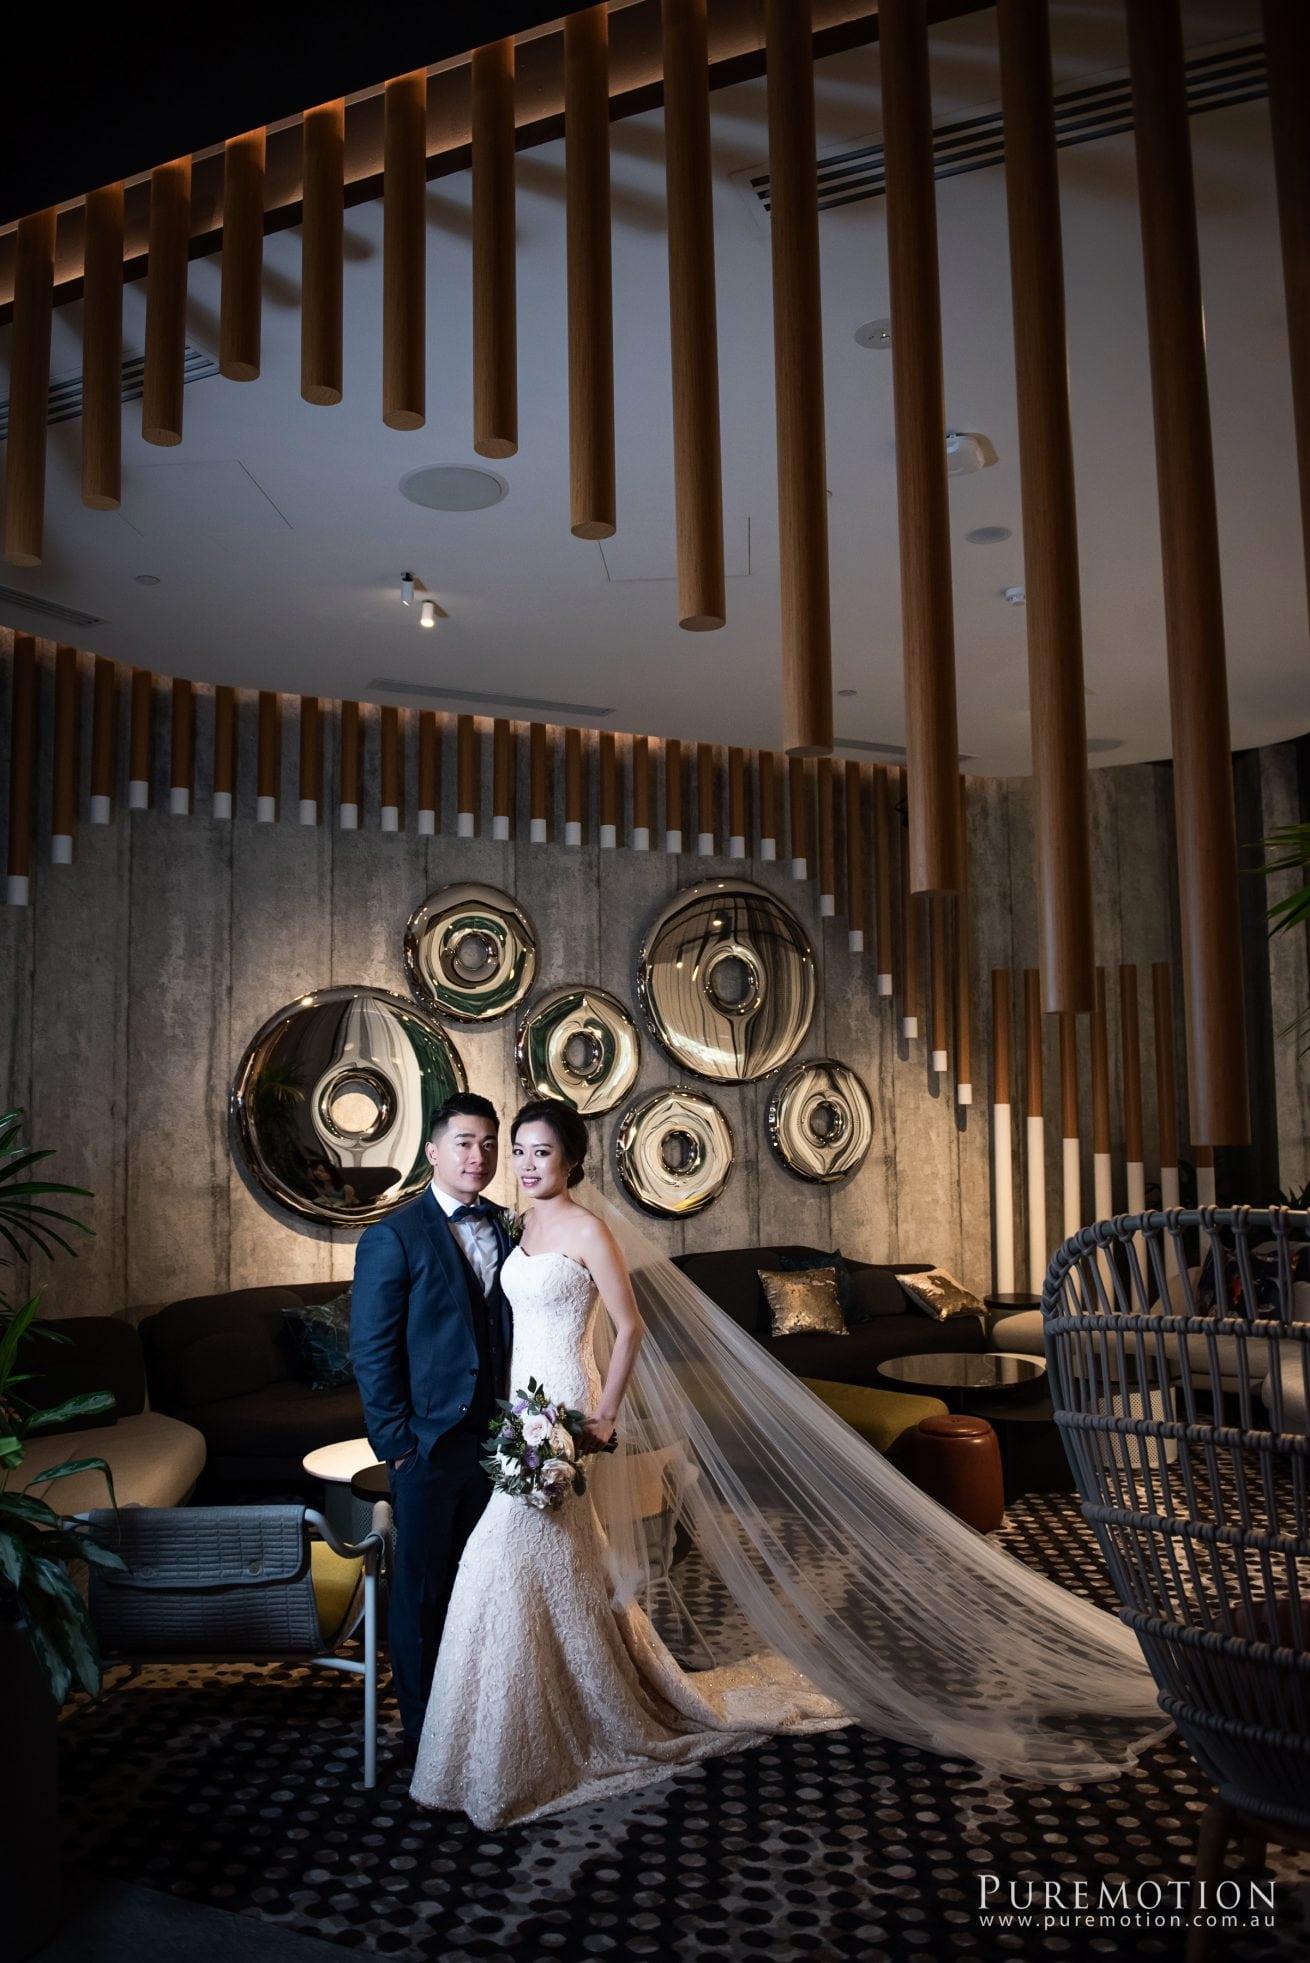 Puremotion Wedding Photography Alex Huang Brisbane W Hotel061